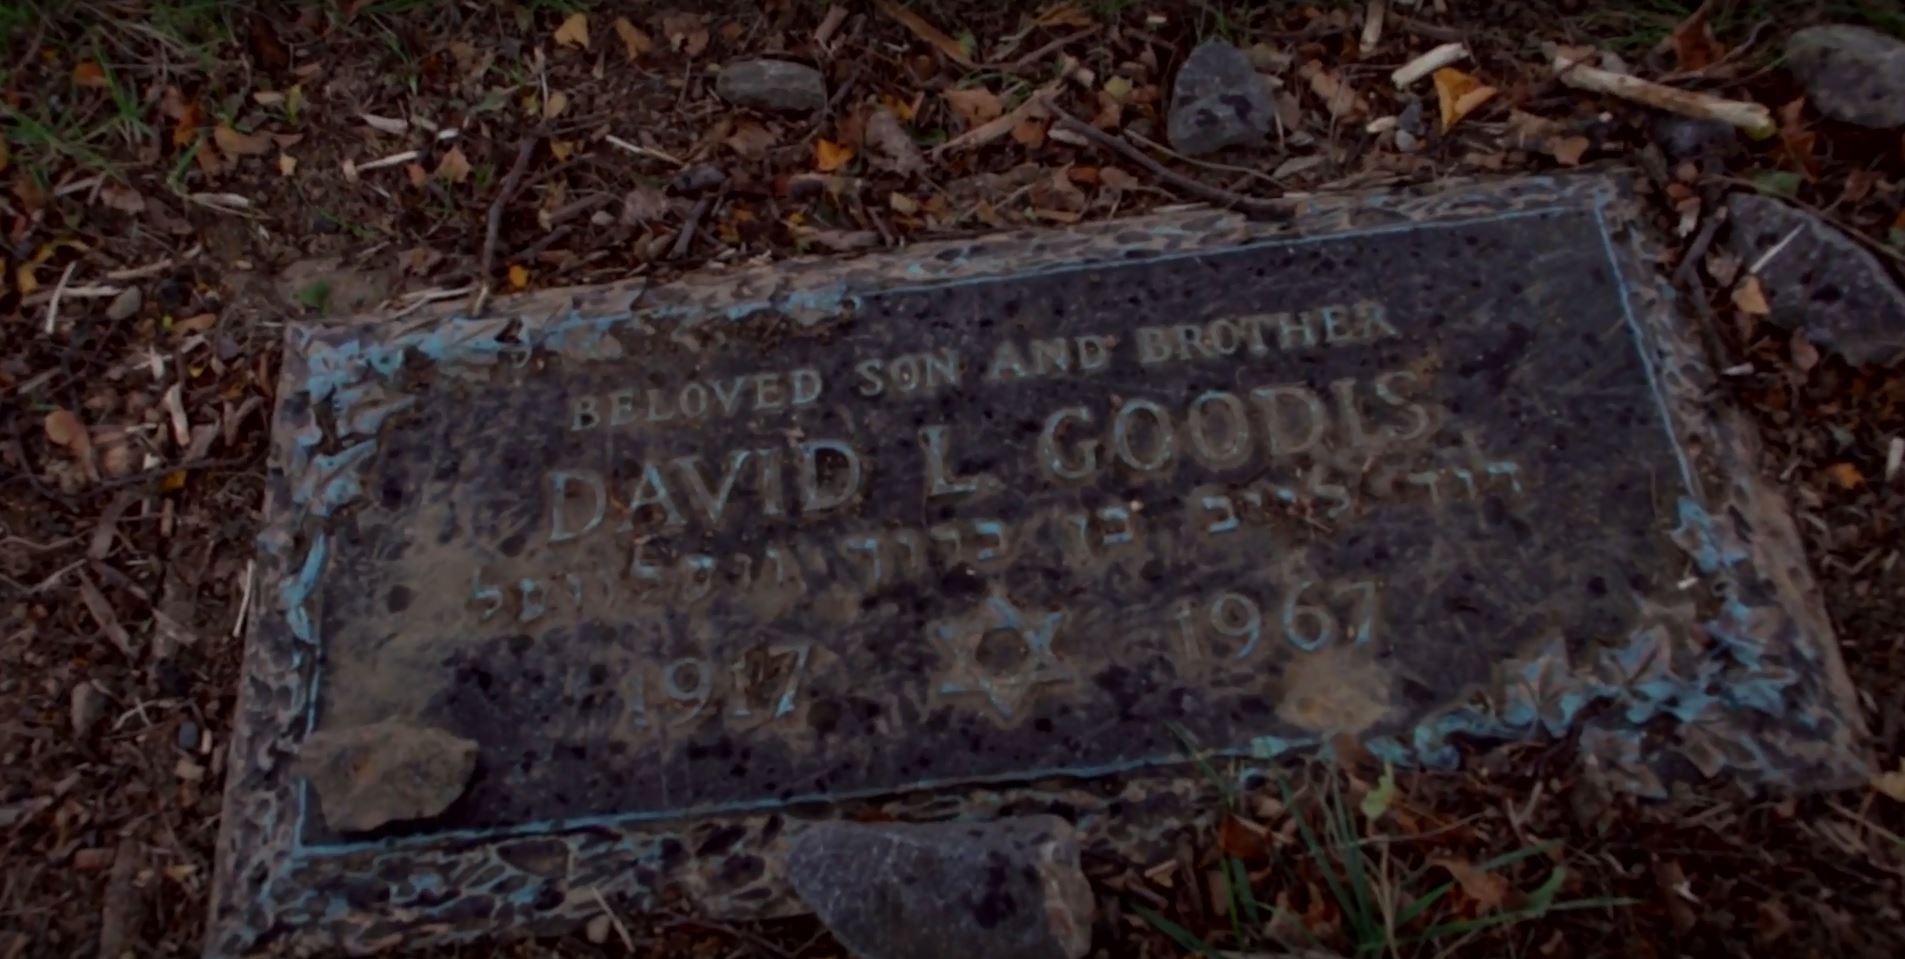 David Goodis Biography